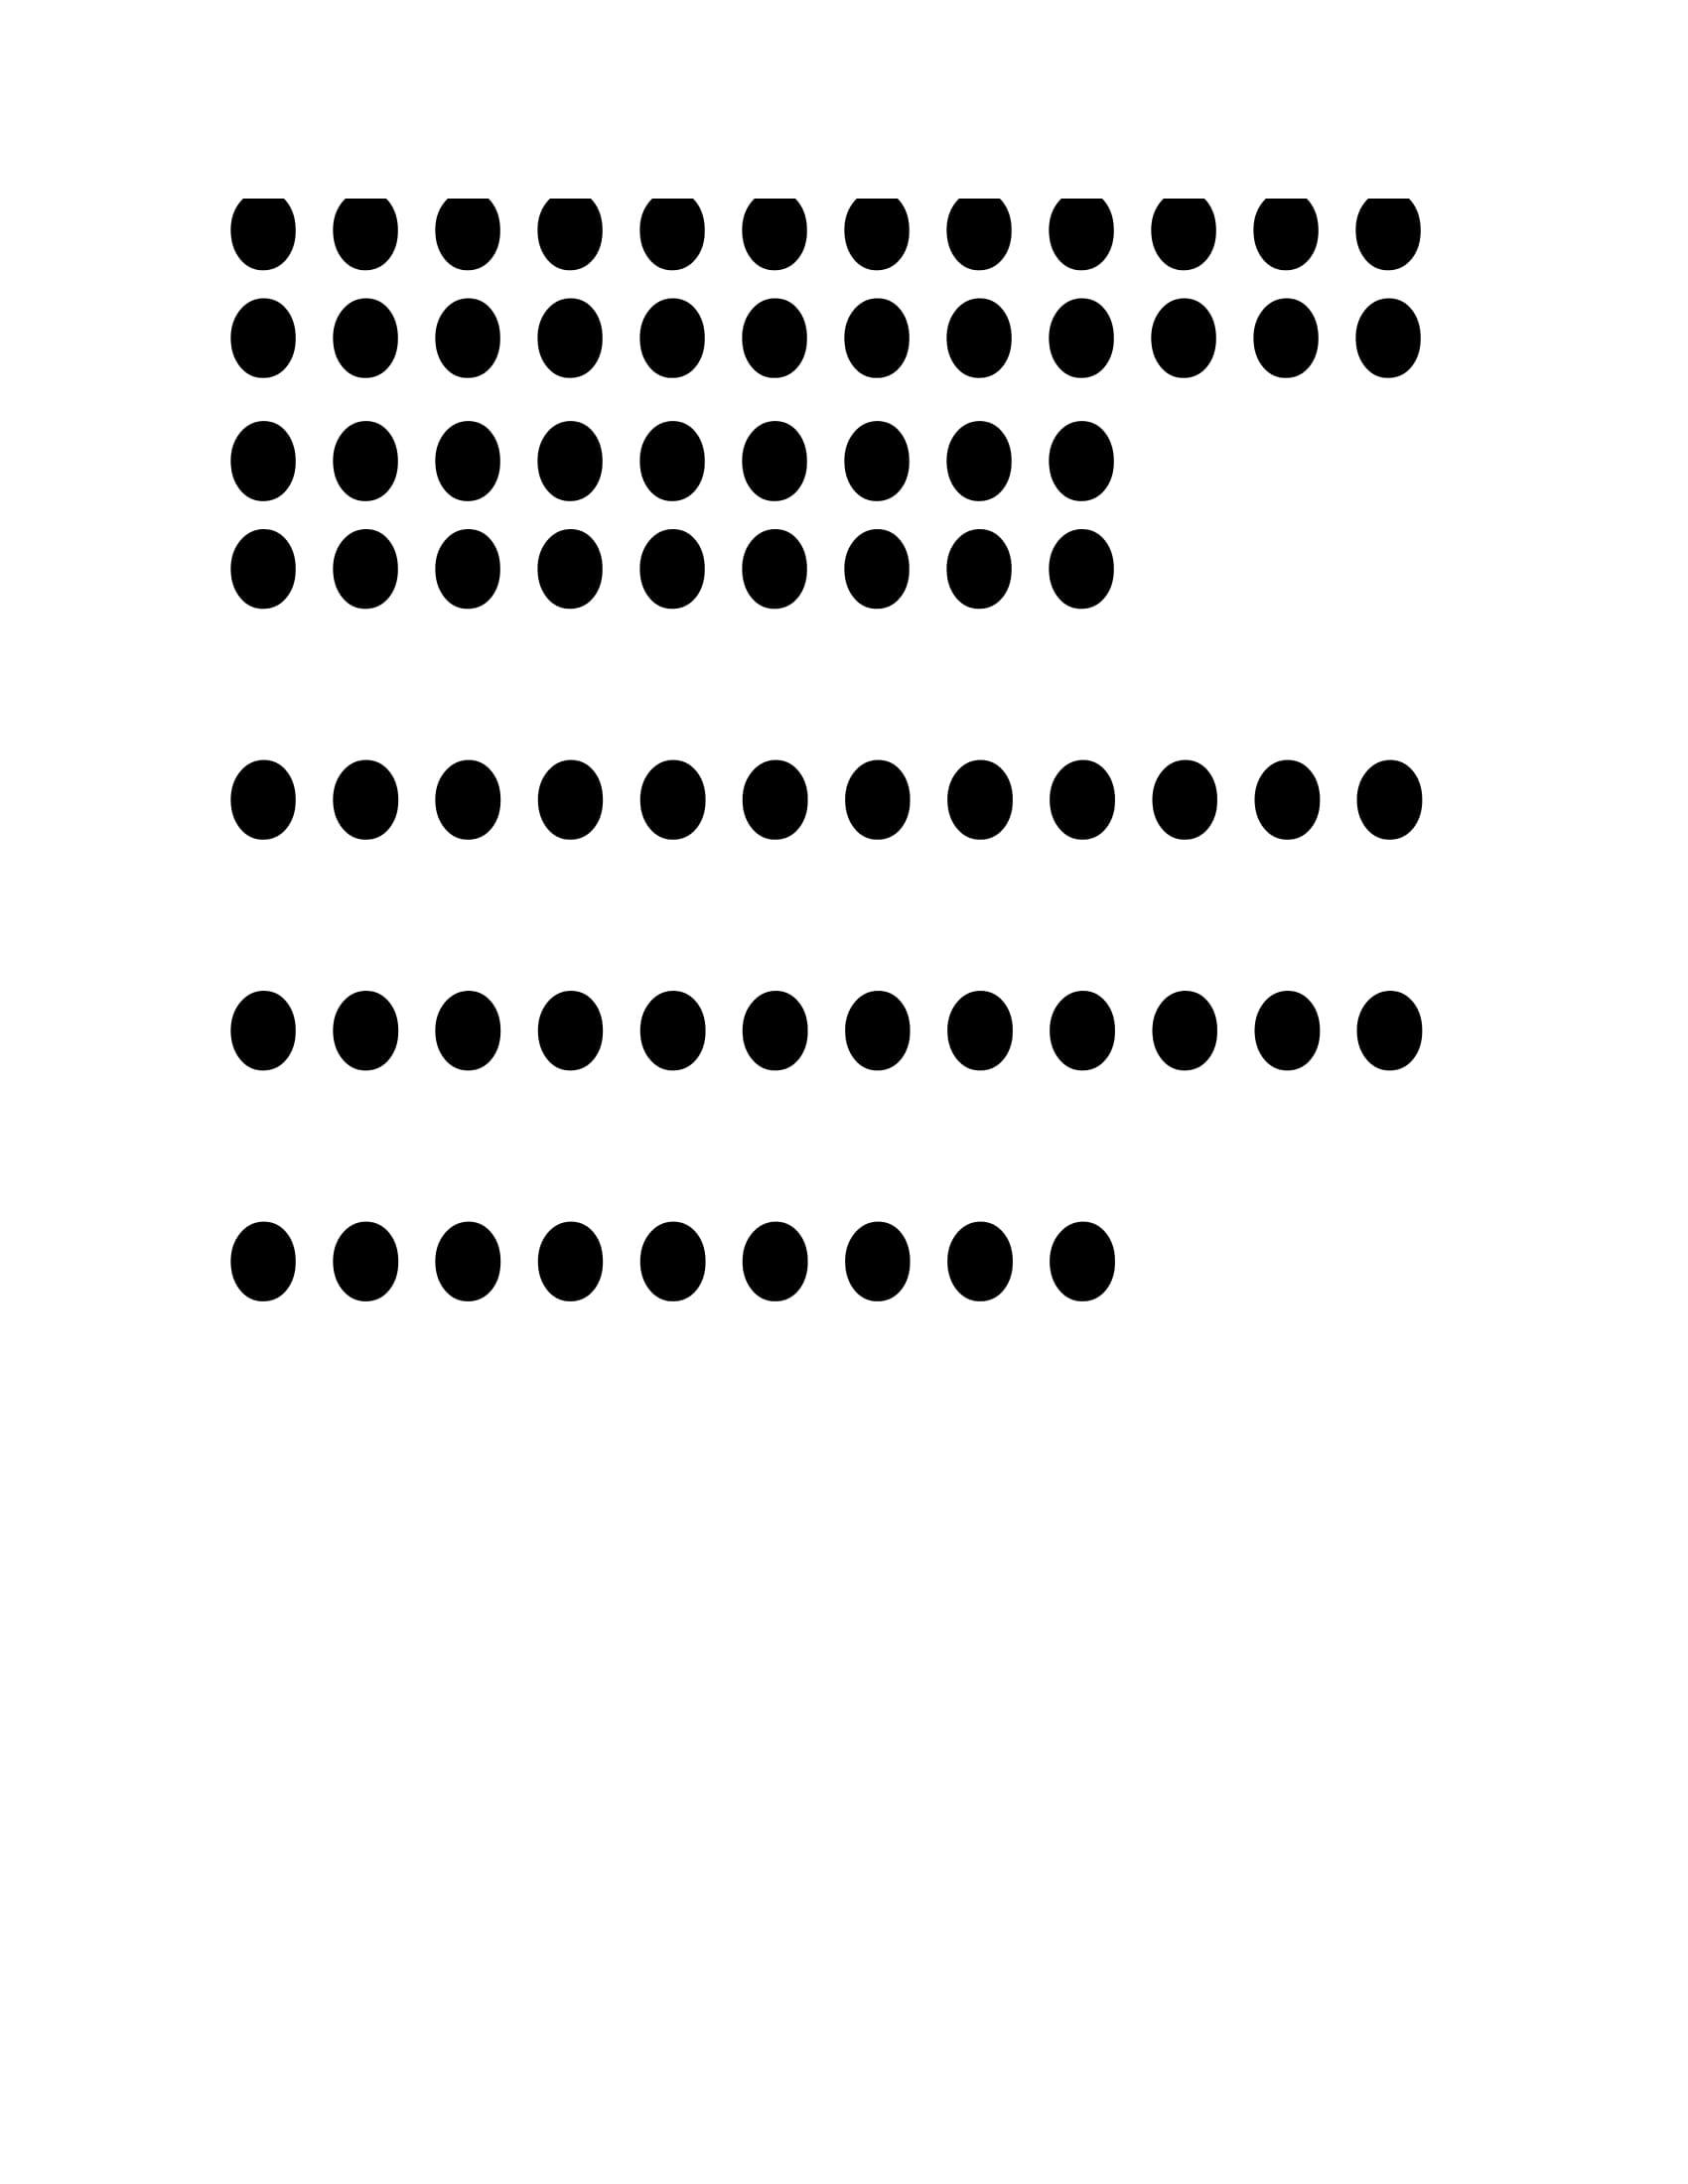 dots 1-5